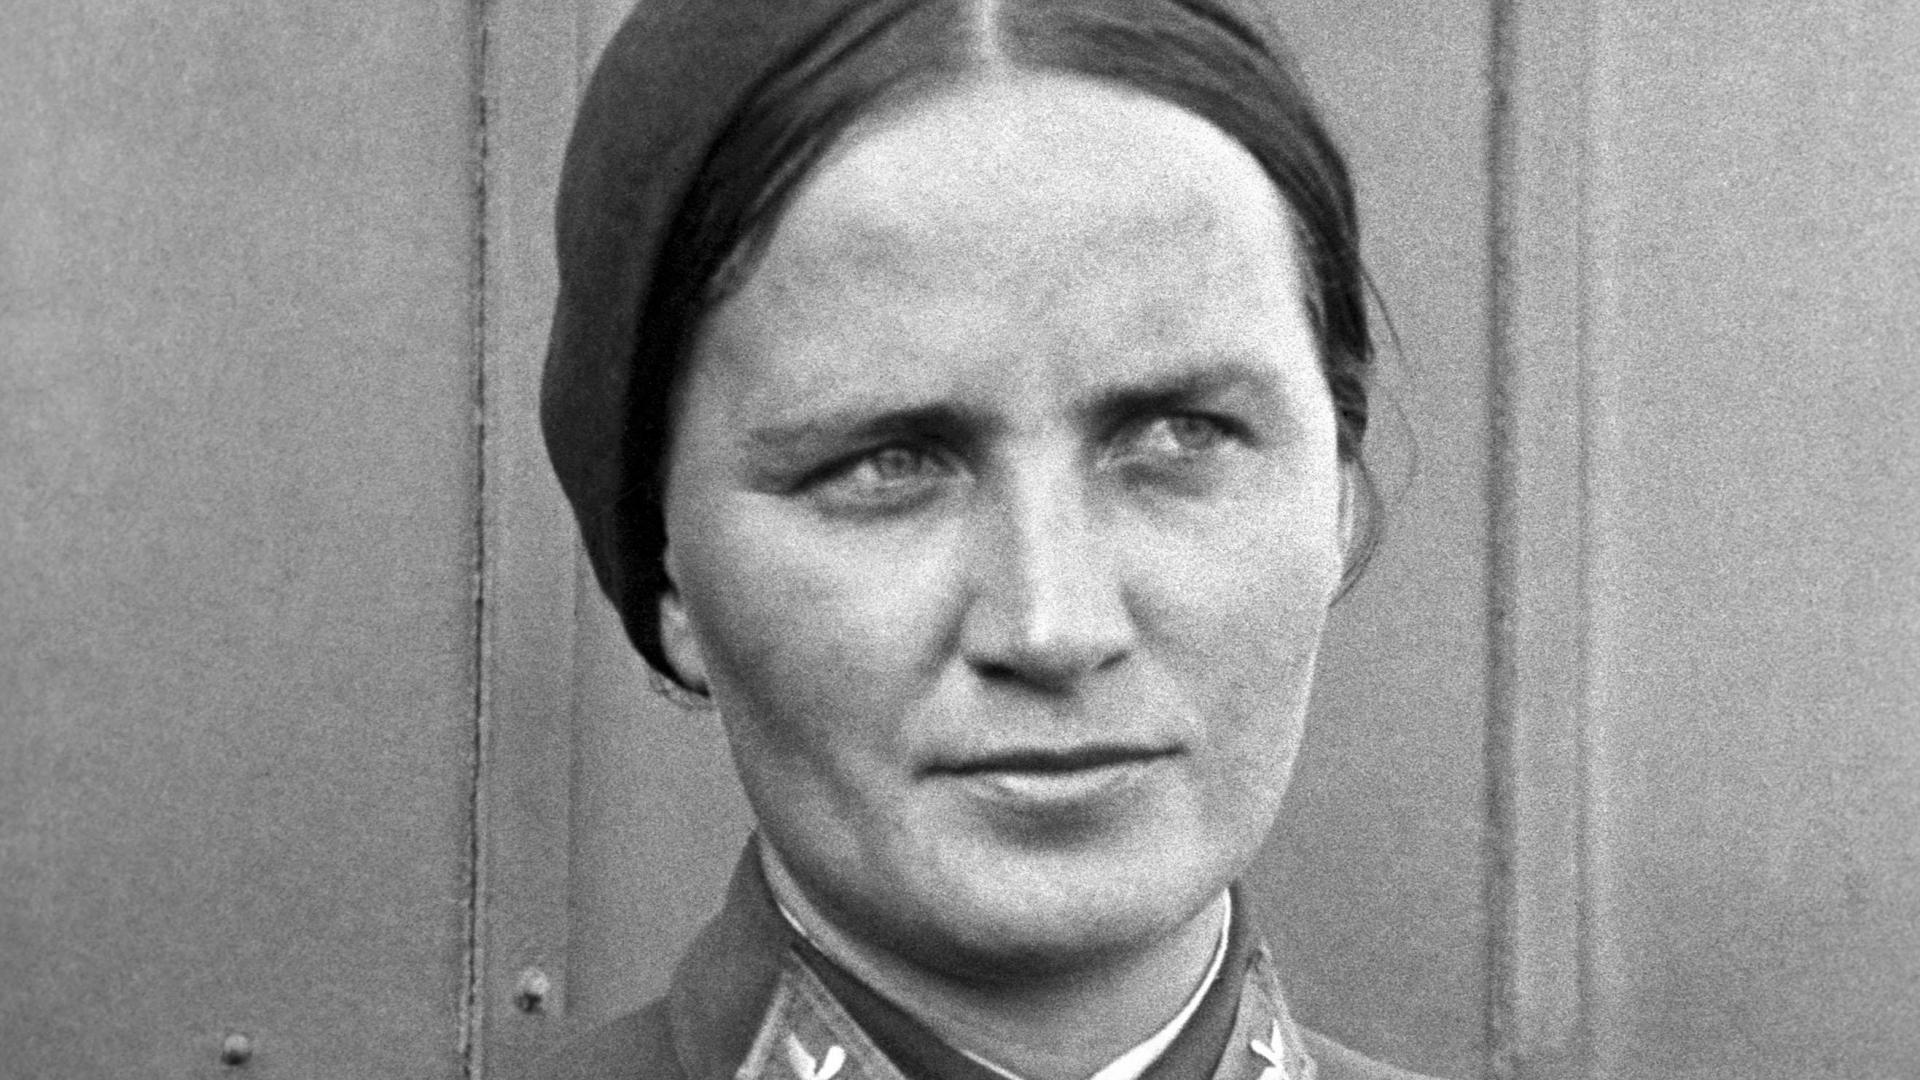 Marina Raskova, Moscow, 1938. (Credit: ITAR-TASS Photo Agency/Alamy Stock Photo)